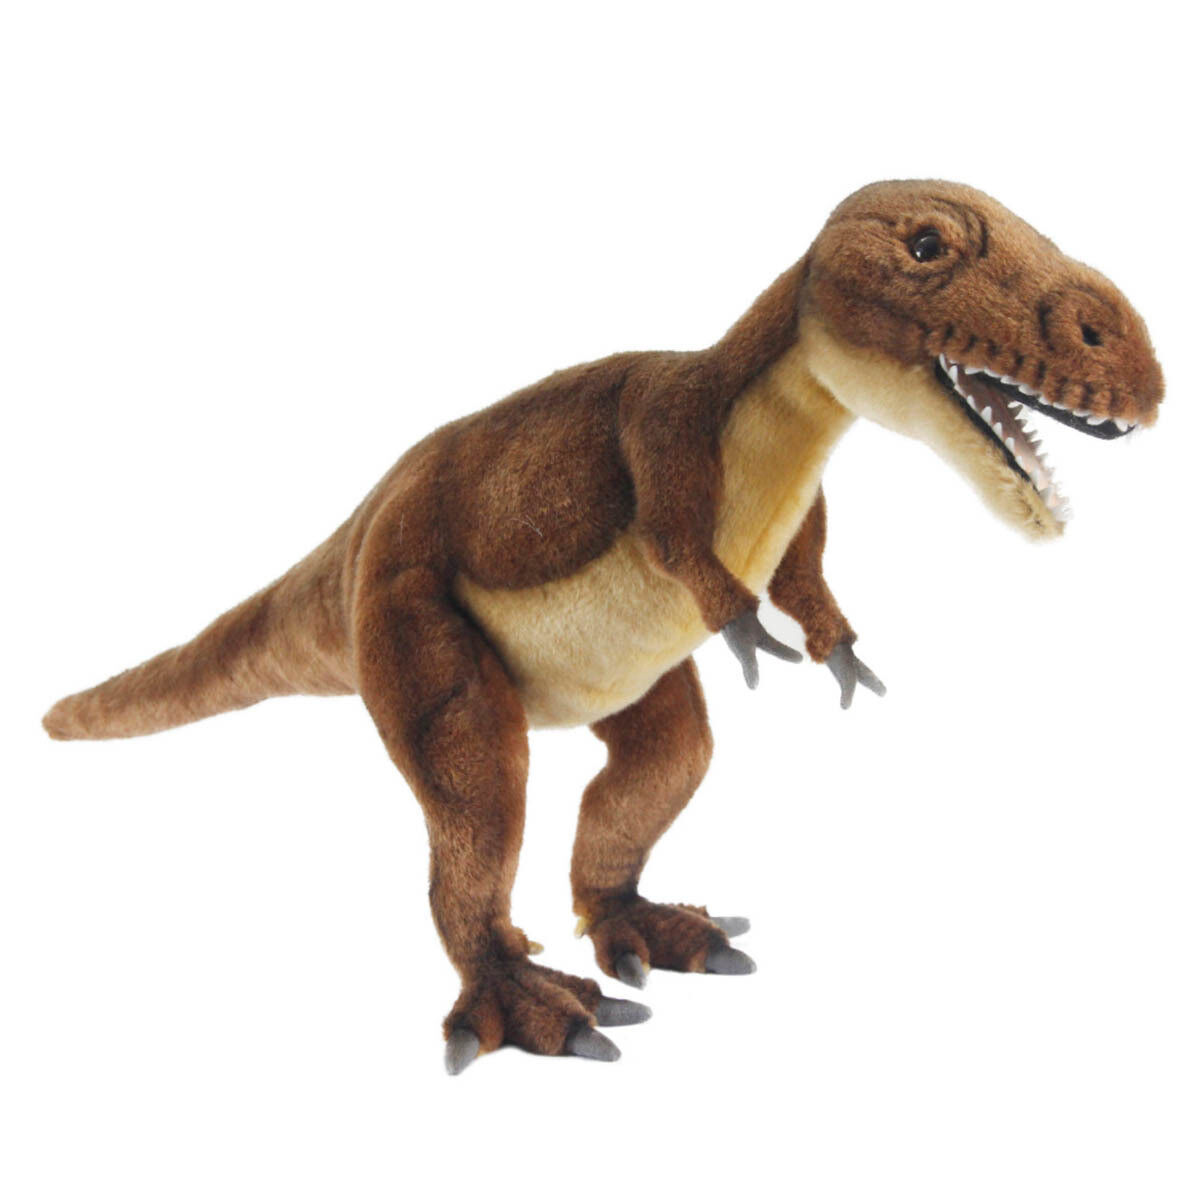 Hansa Tiranosaurio Rex Dinosaurio realista Animal Lindo Suave Juguete de Felpa 66cm  NUEVO